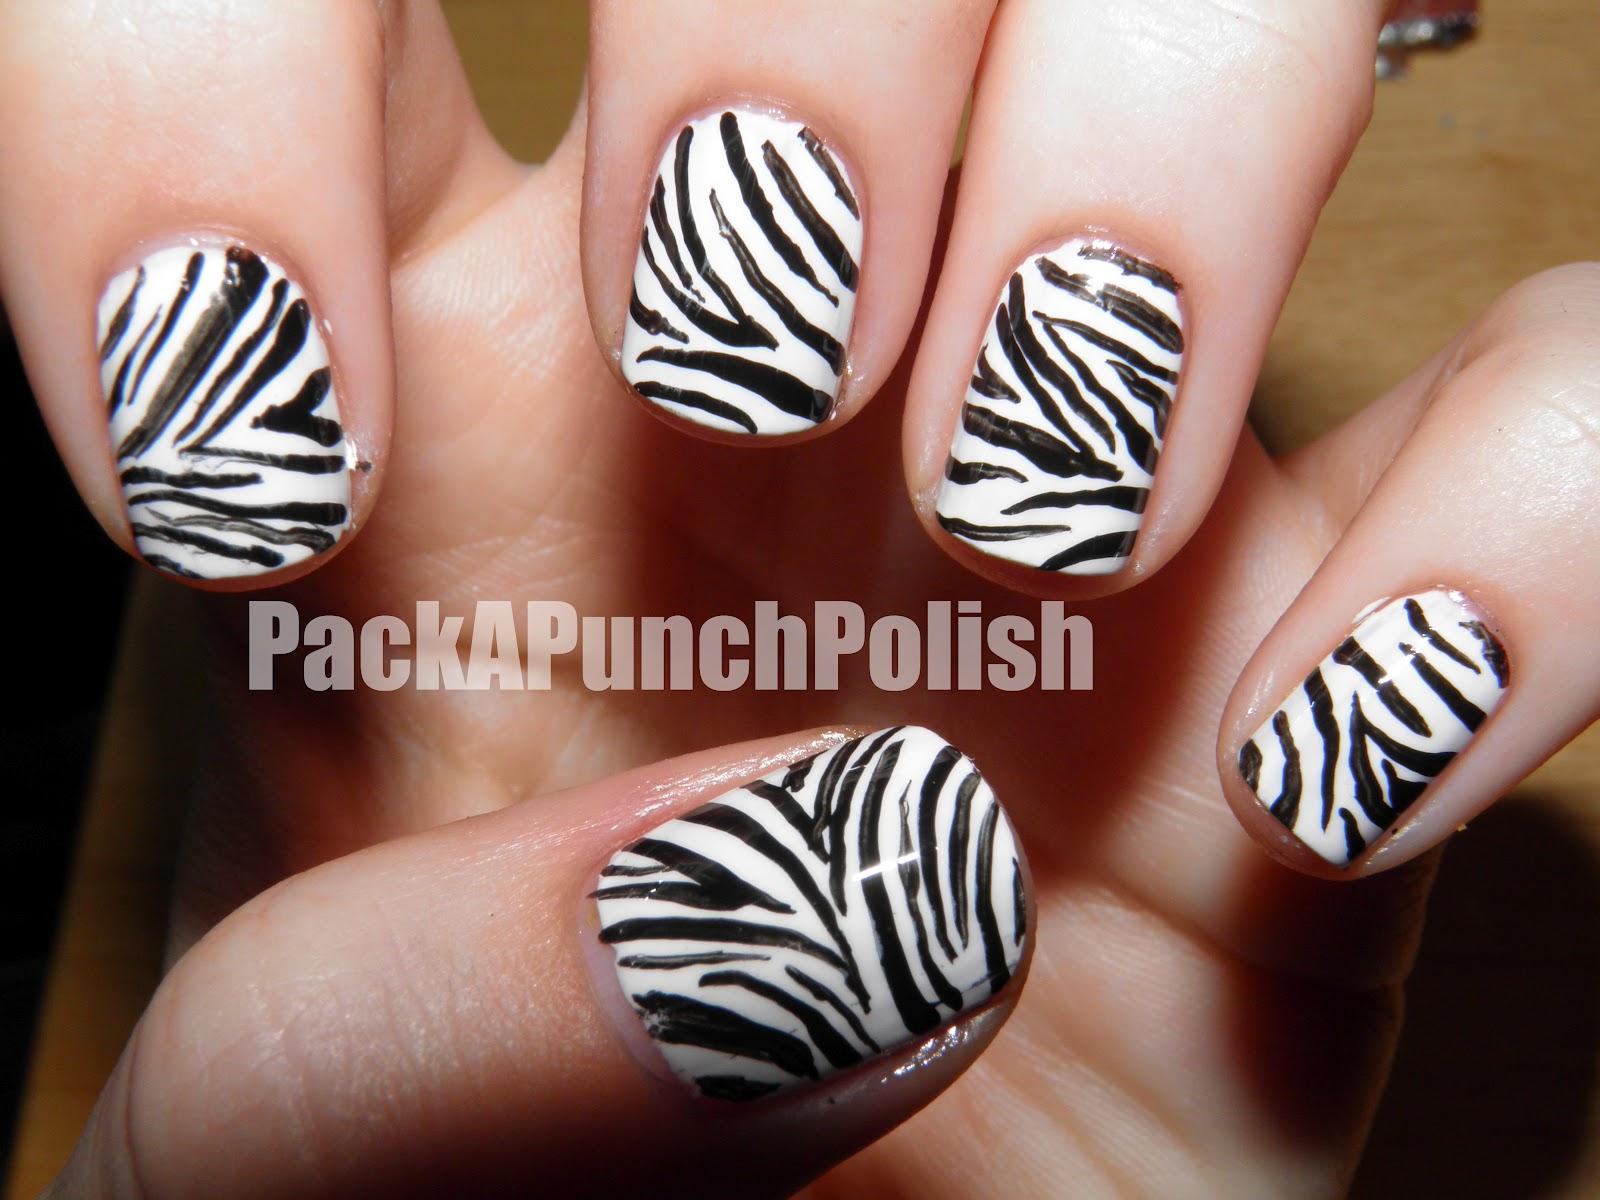 Packapunchpolish How To Zebra Print Nail Art Nail Art Design